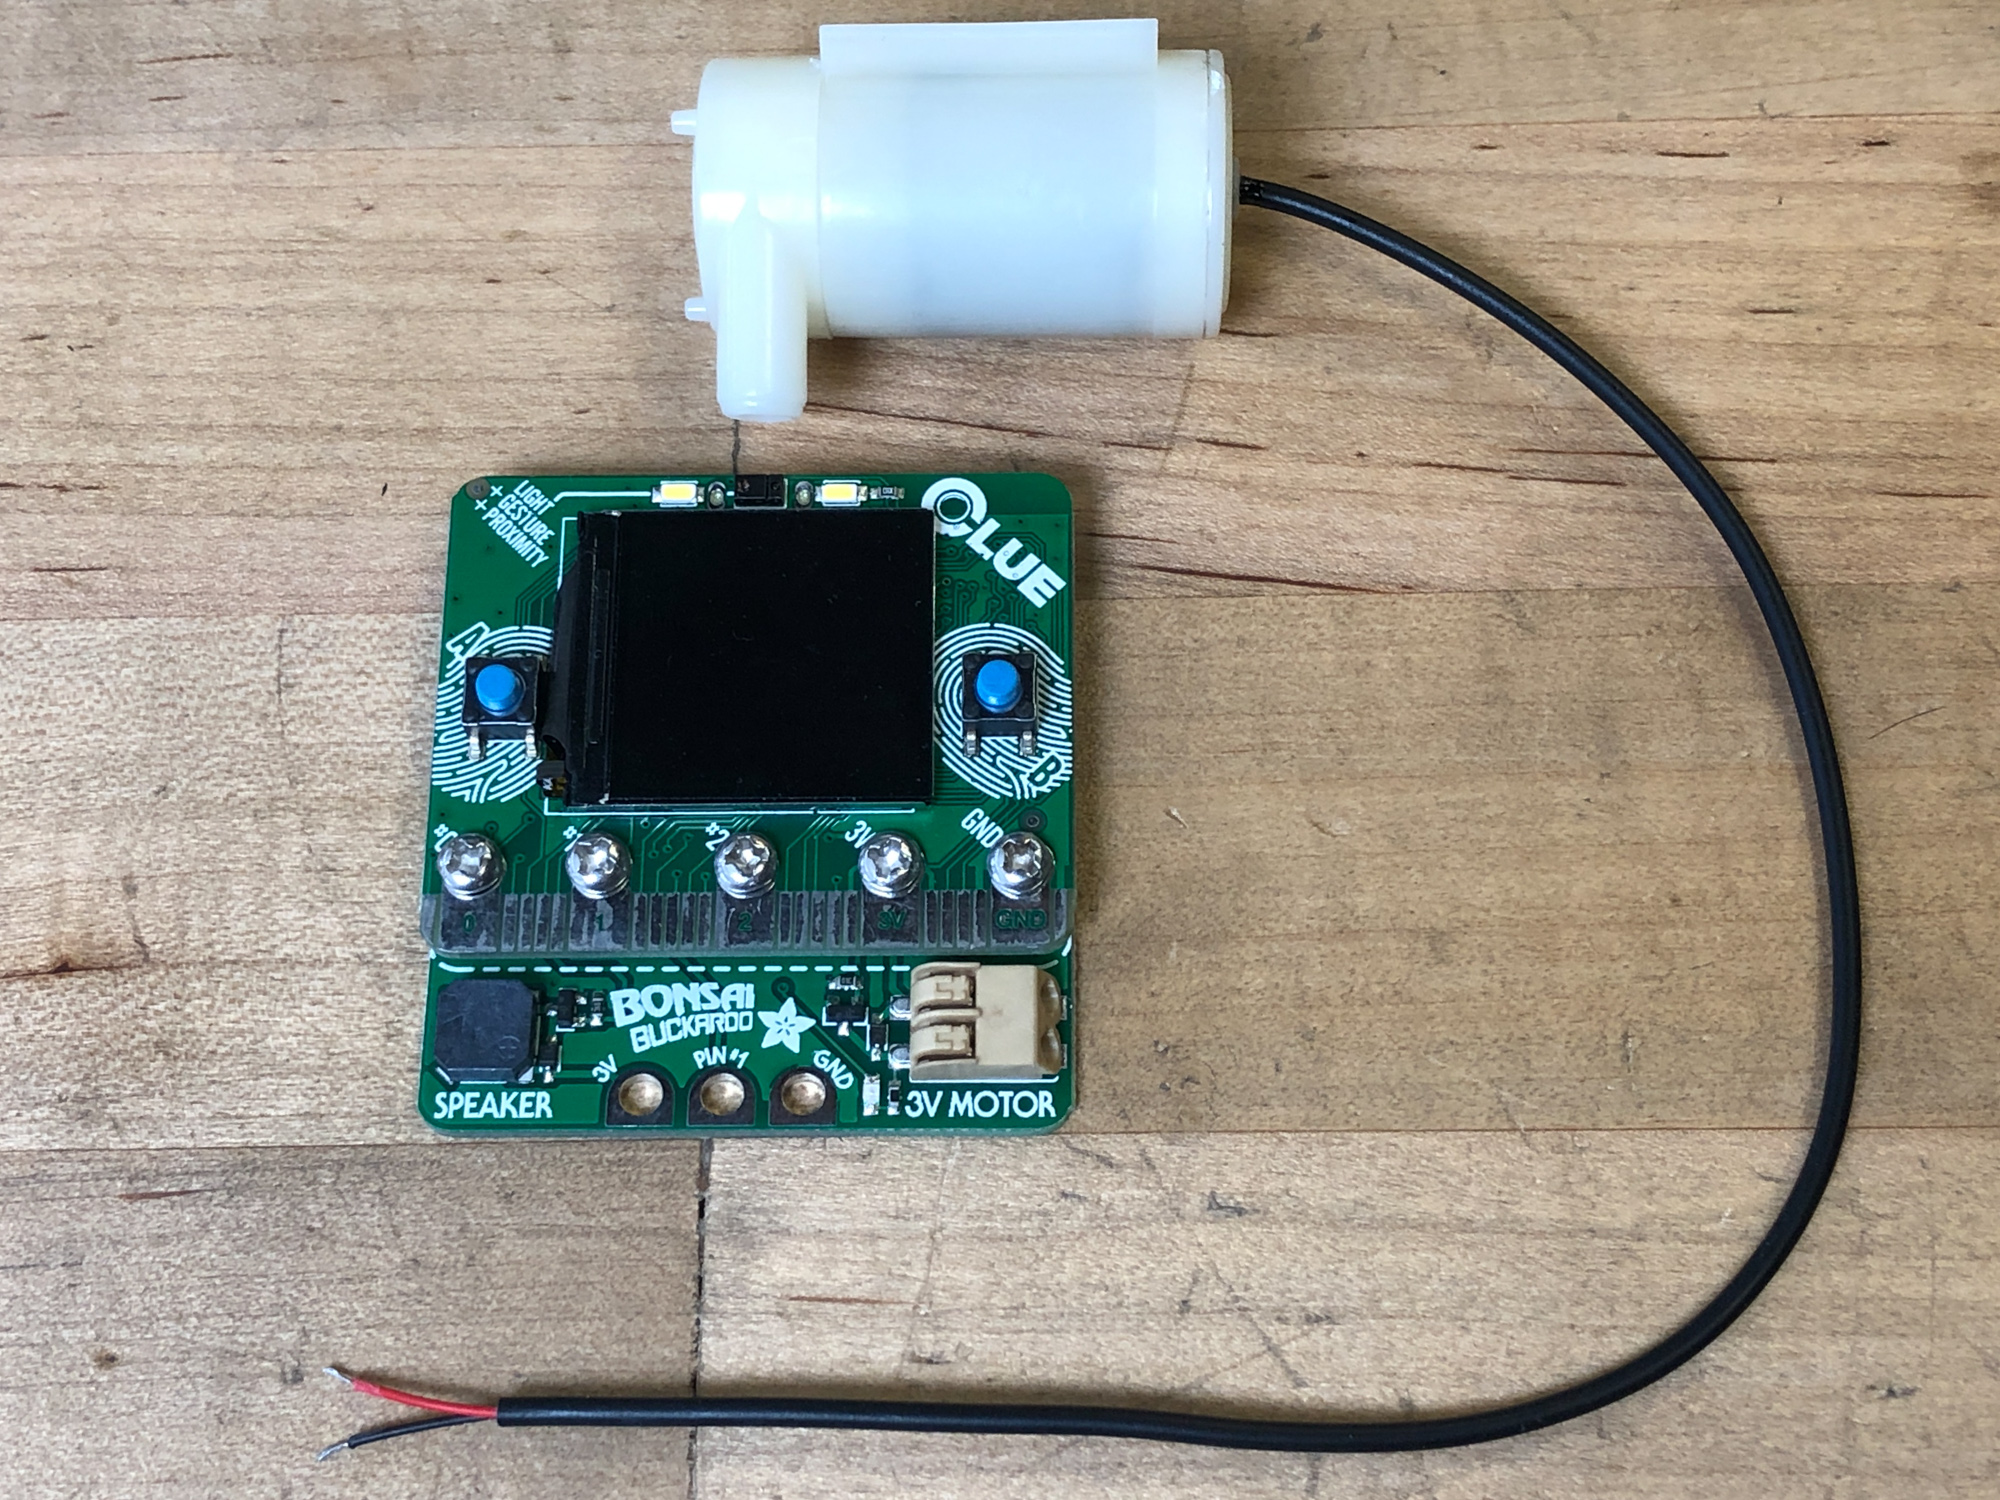 sensors_plant-1294.jpg